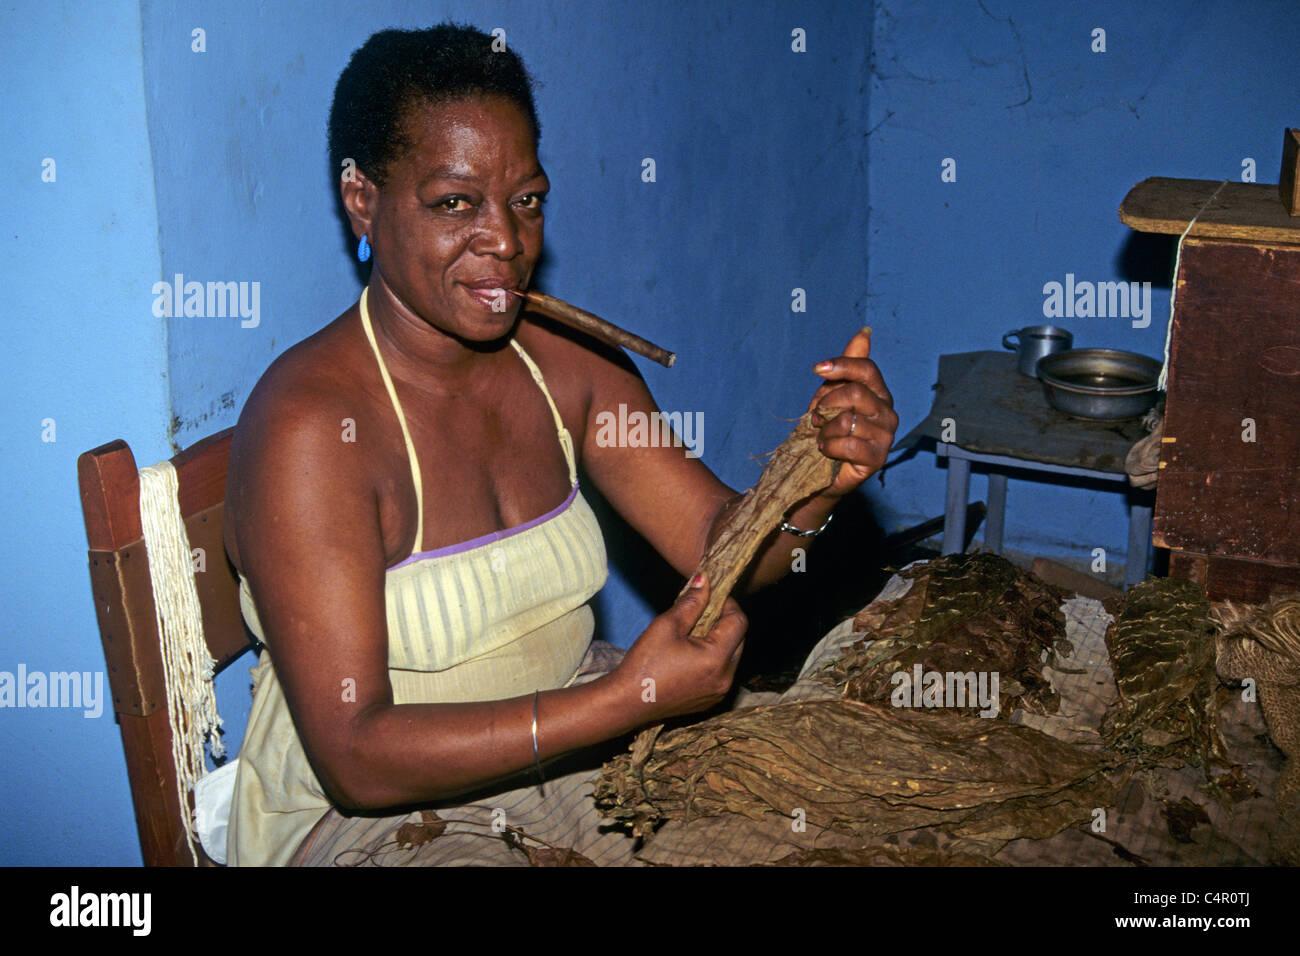 Tabakfabrik kubanerin ferigt Comiczeichners Zigarren, Tabak Fabrik Kubanerin Herstellung kubanischen Zigarren Stockbild